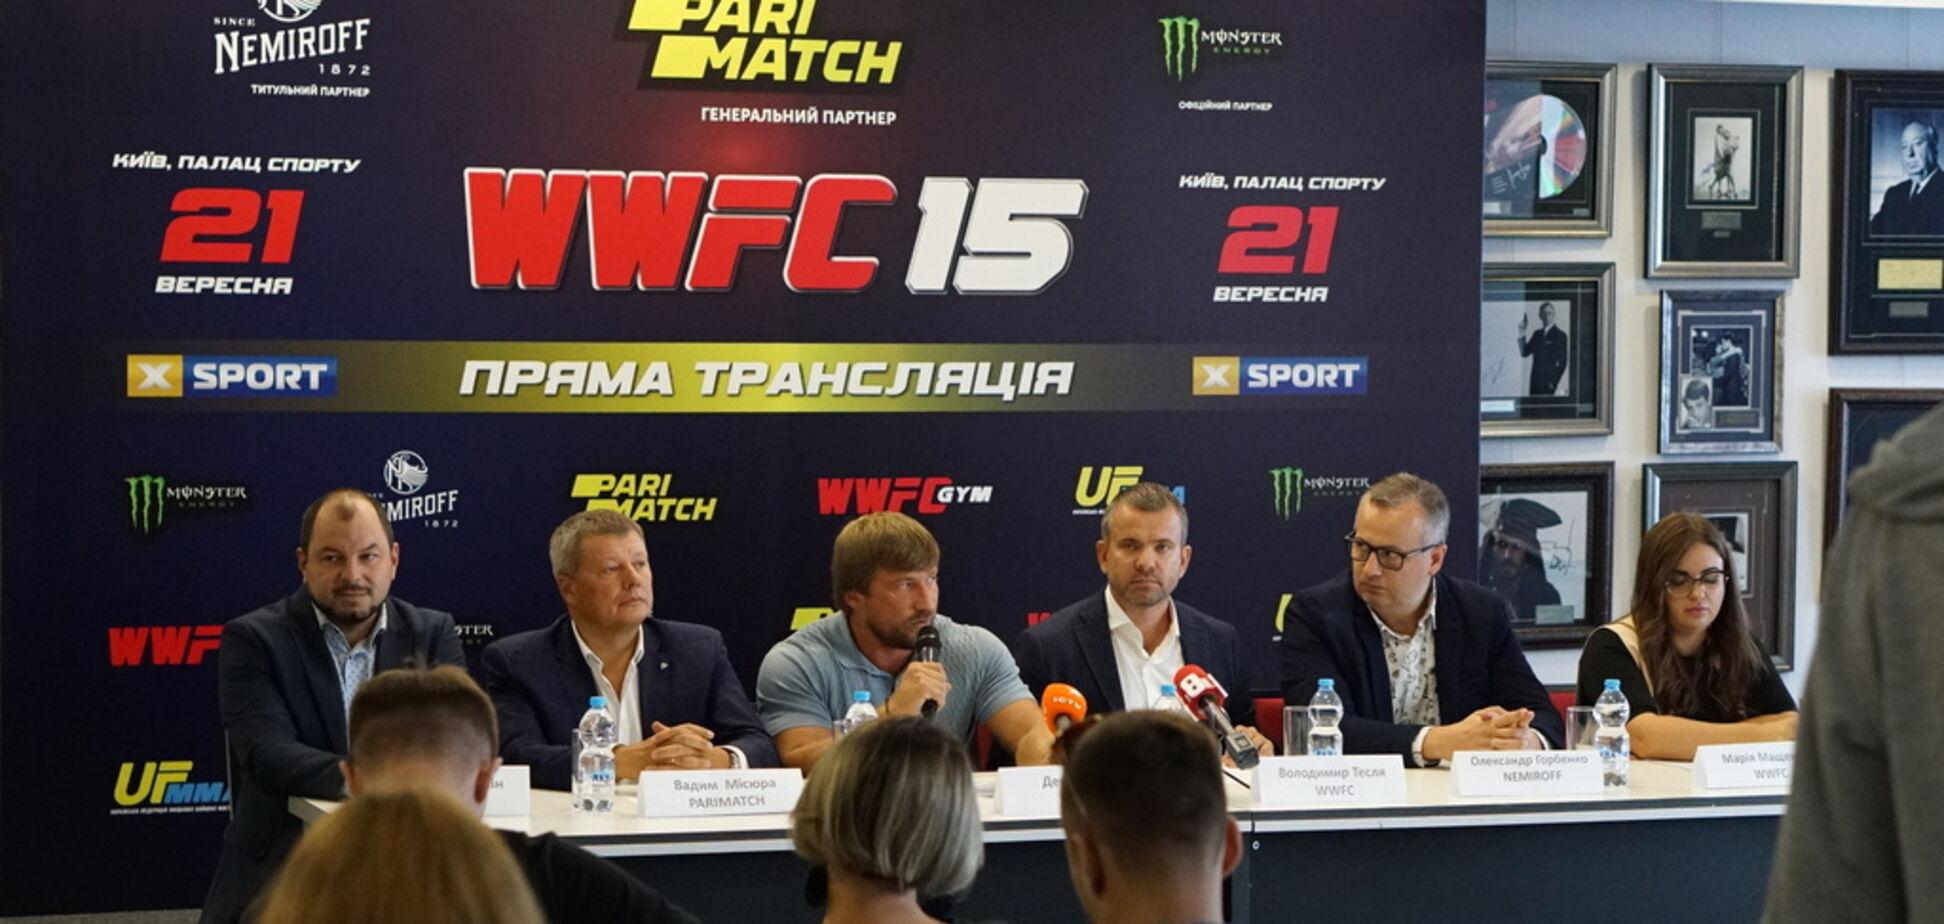 Лига WWFC представила стратегию развития ММА в Украине